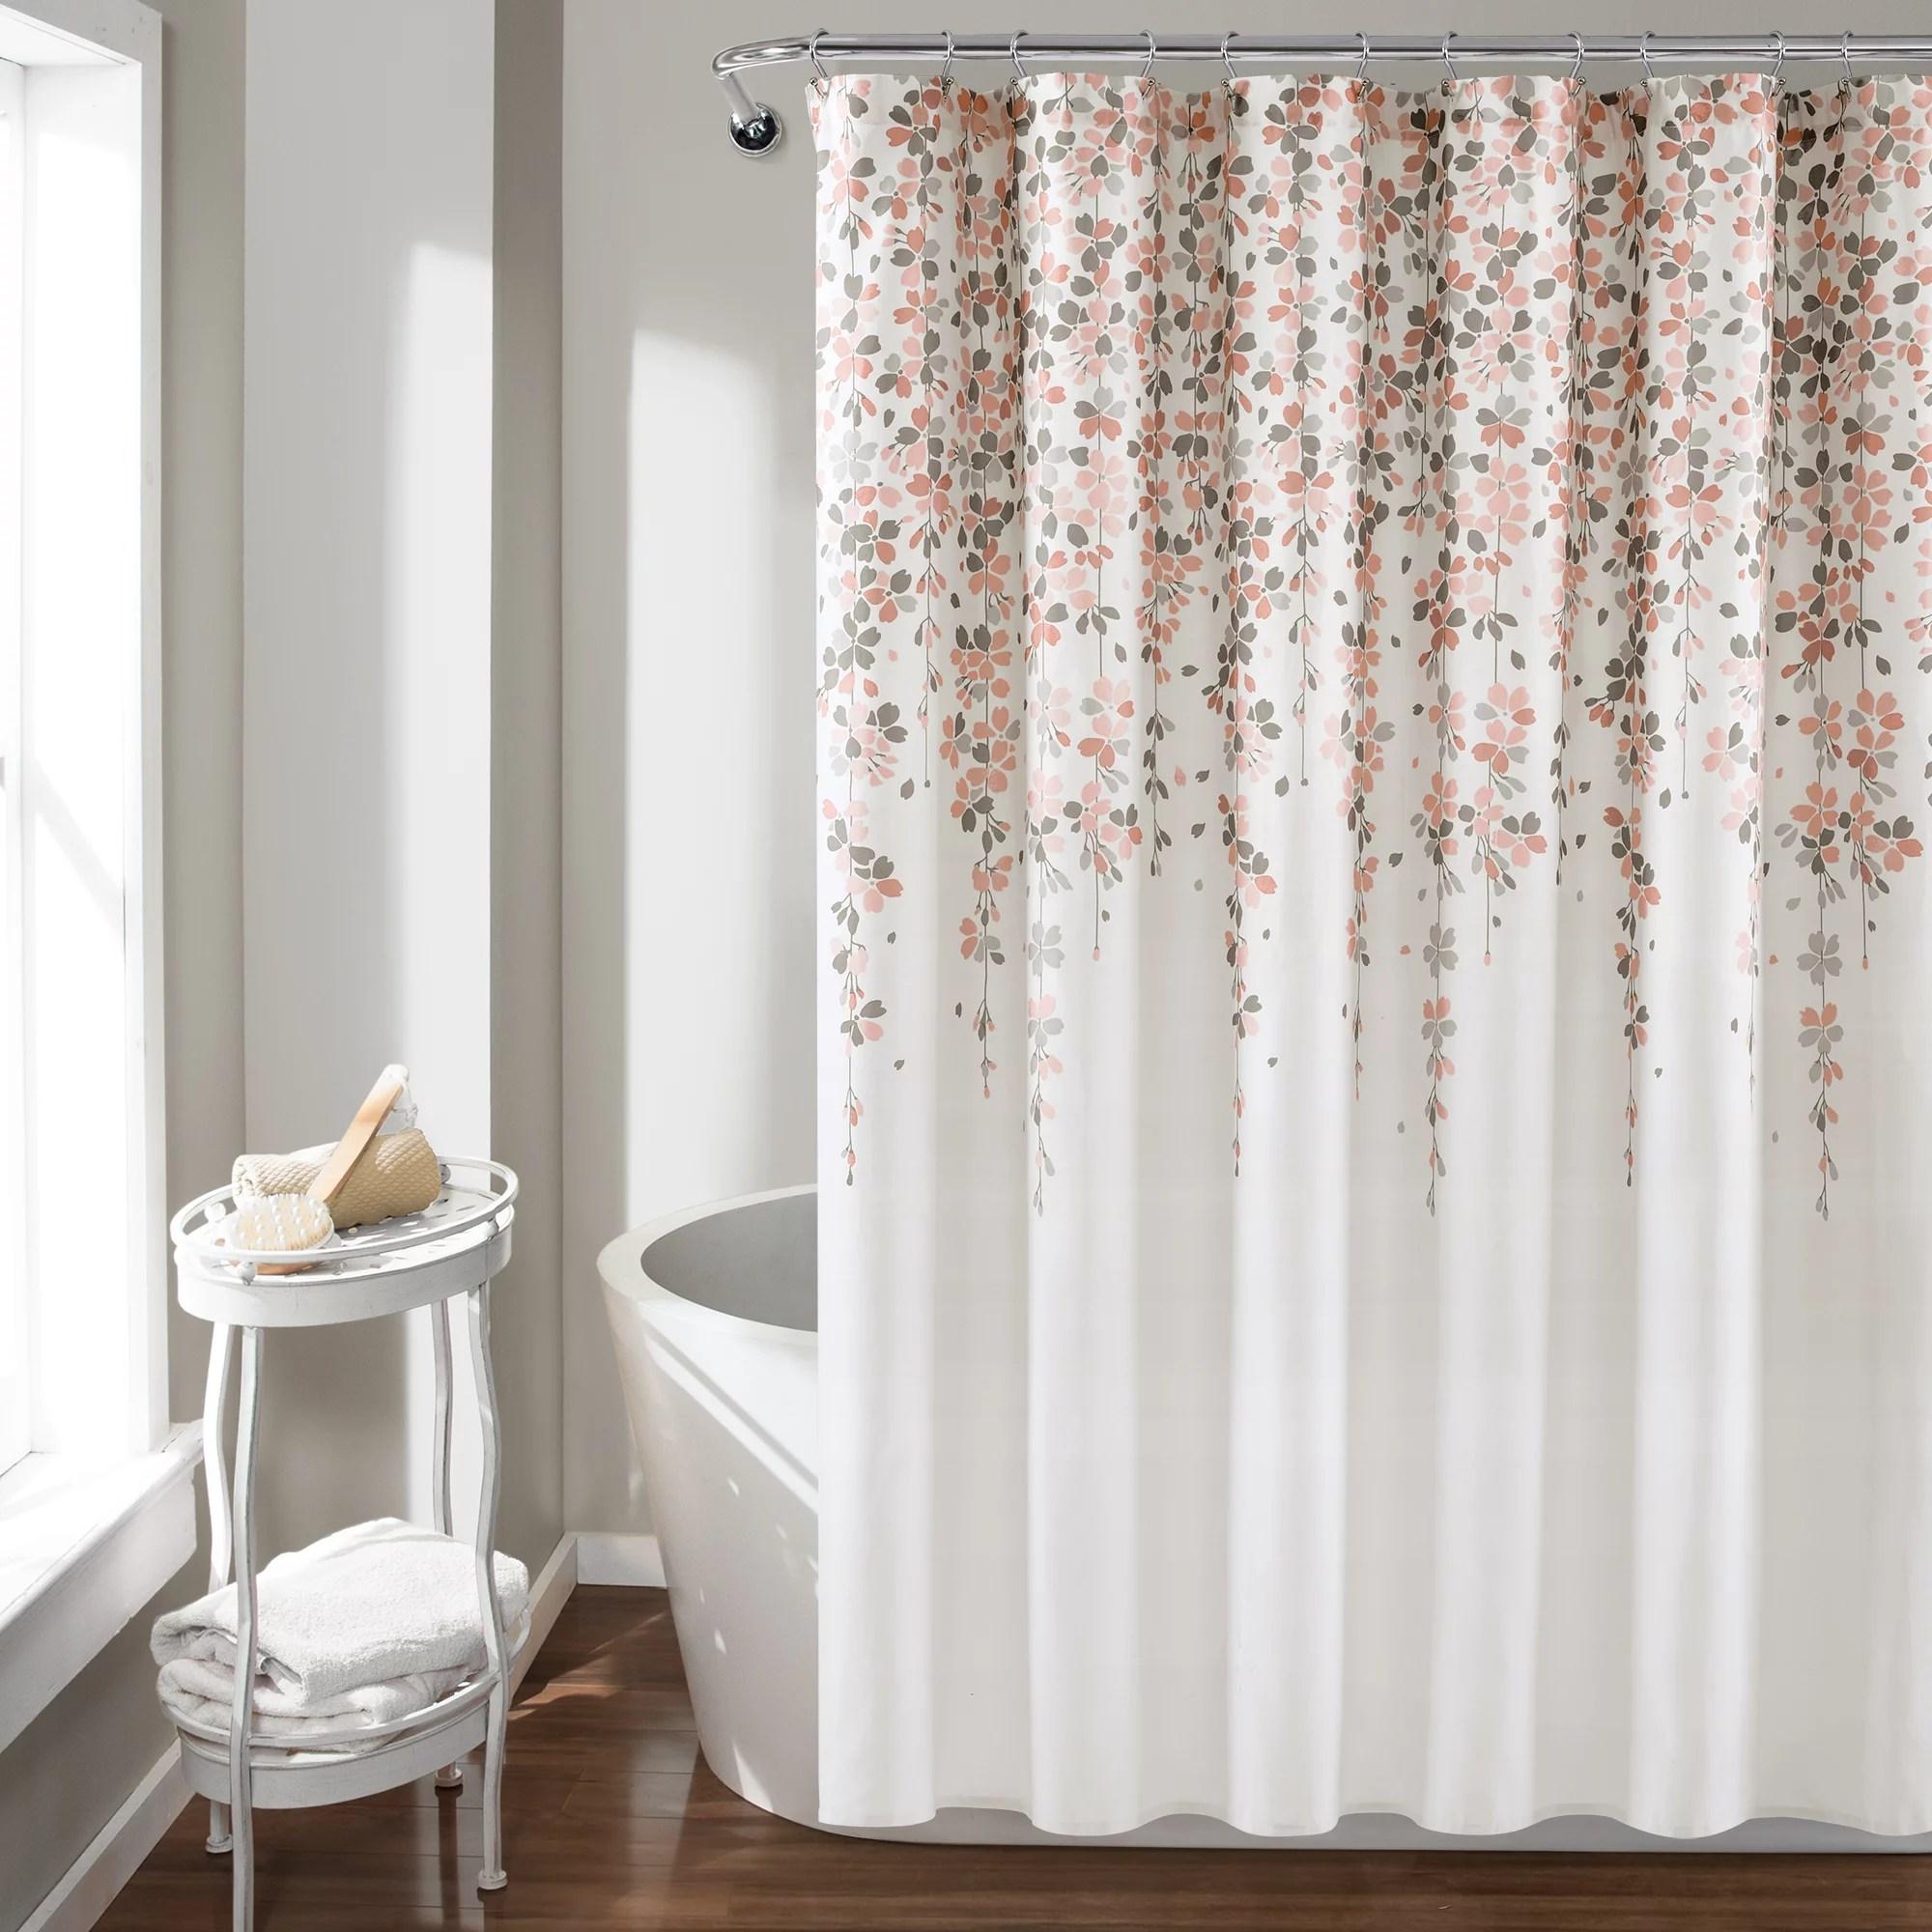 lush decor weeping flower shower curtain 72x72 blush gray single walmart com